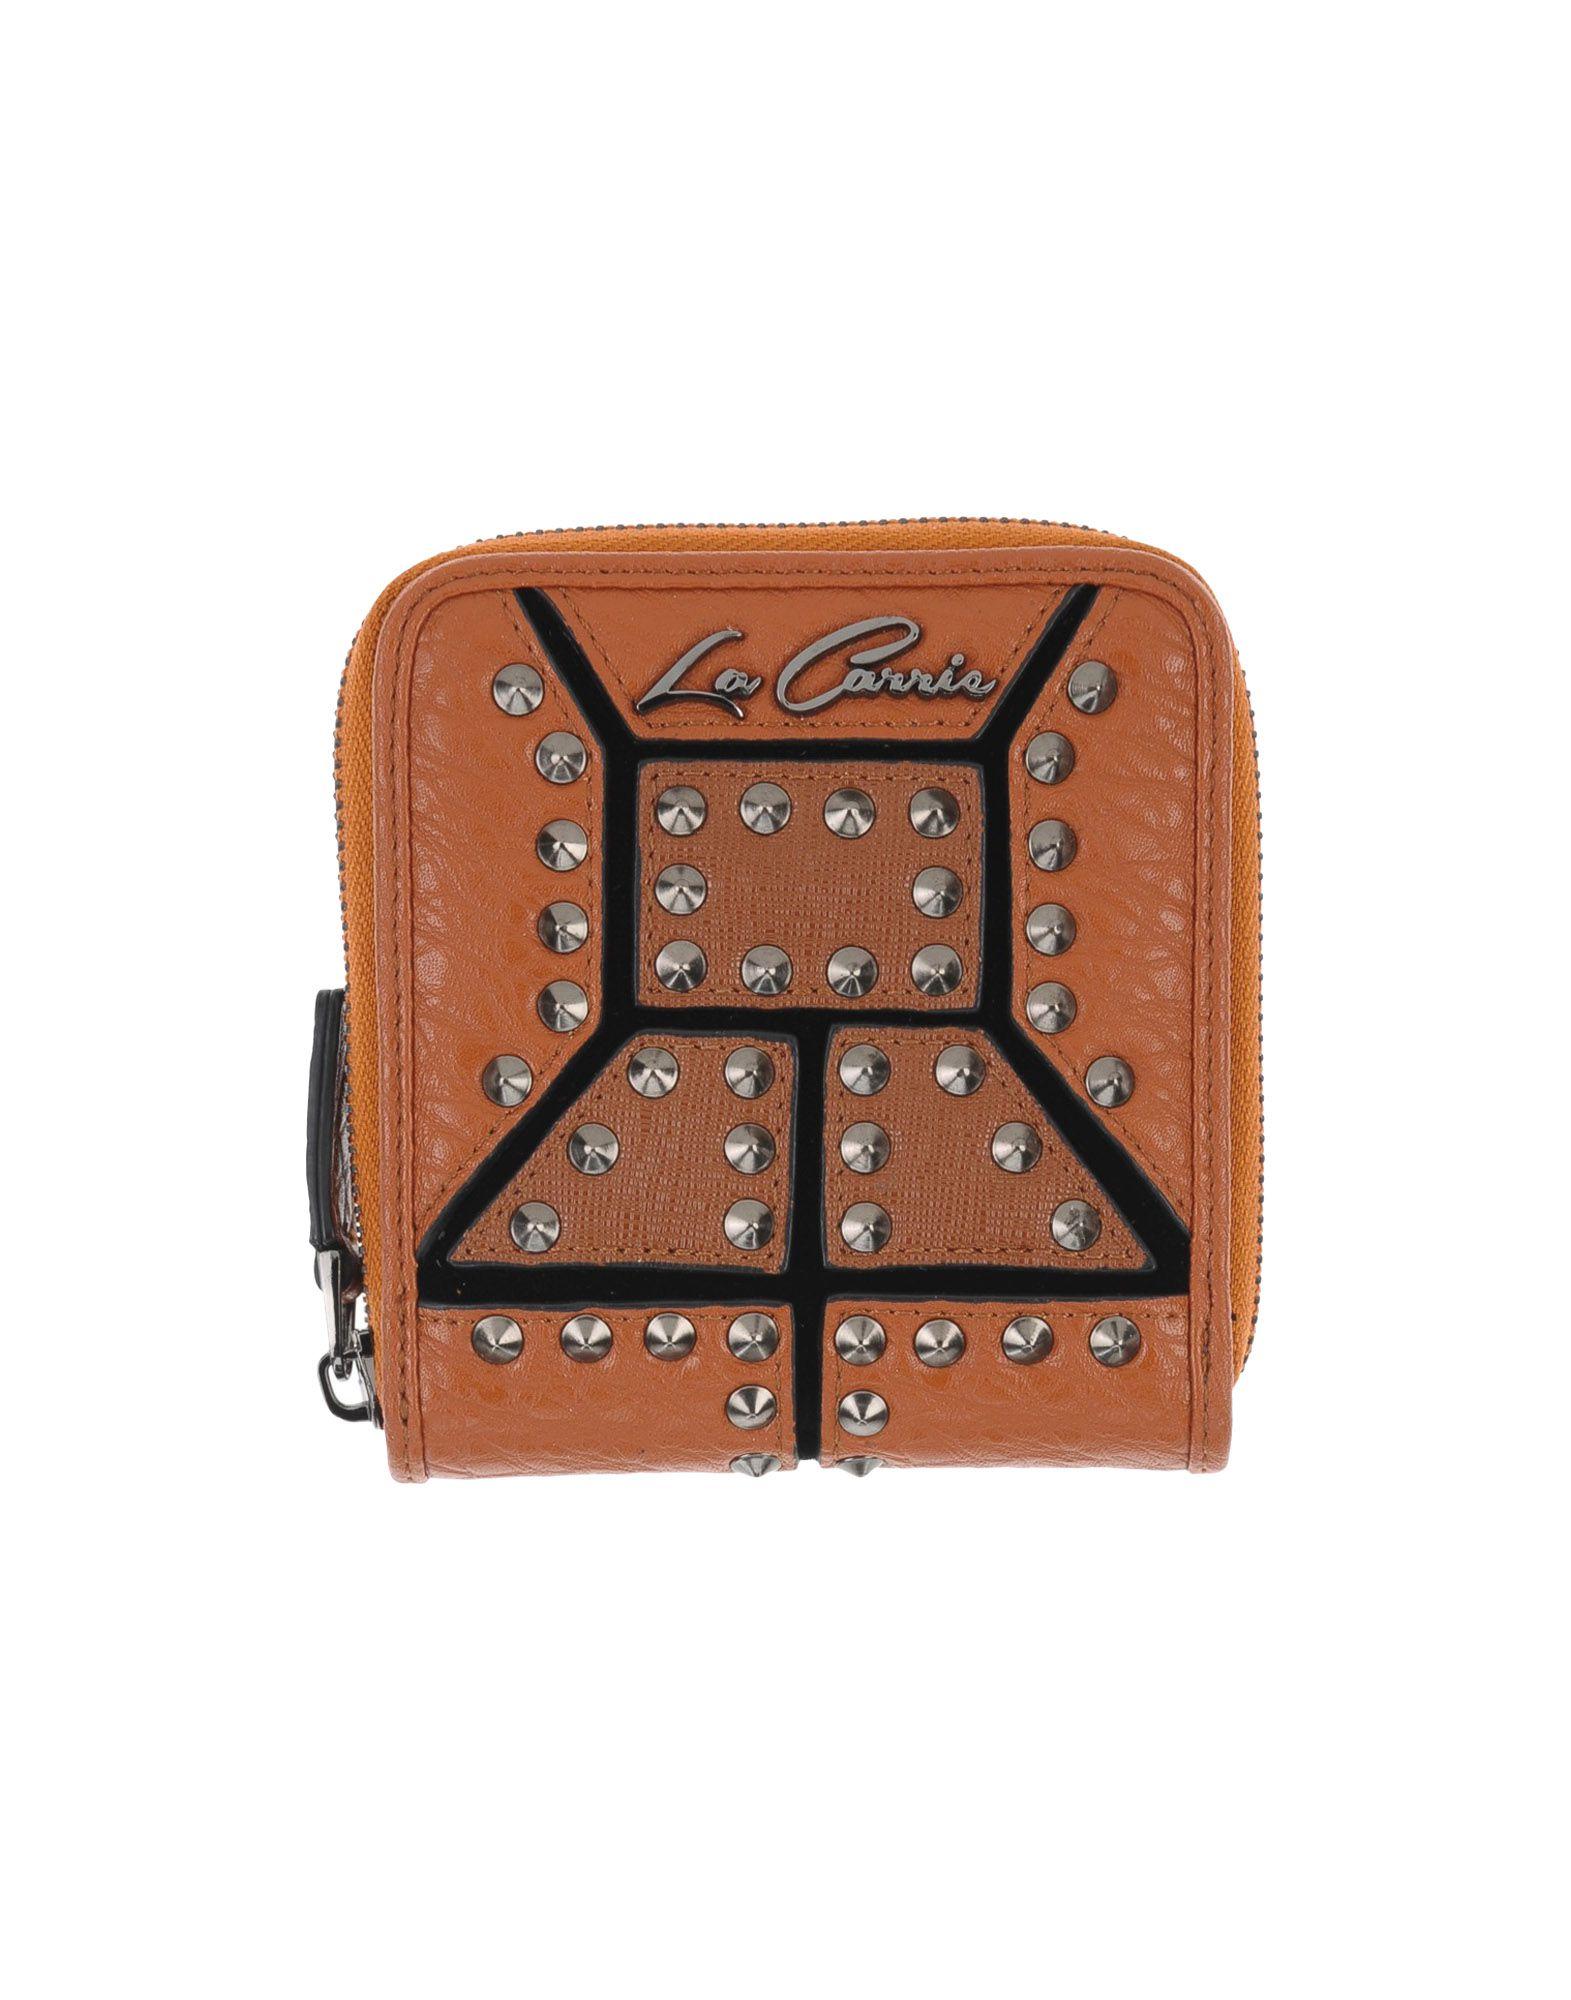 LA CARRIE BAG Damen Brieftasche Farbe Lederfarben Größe 1